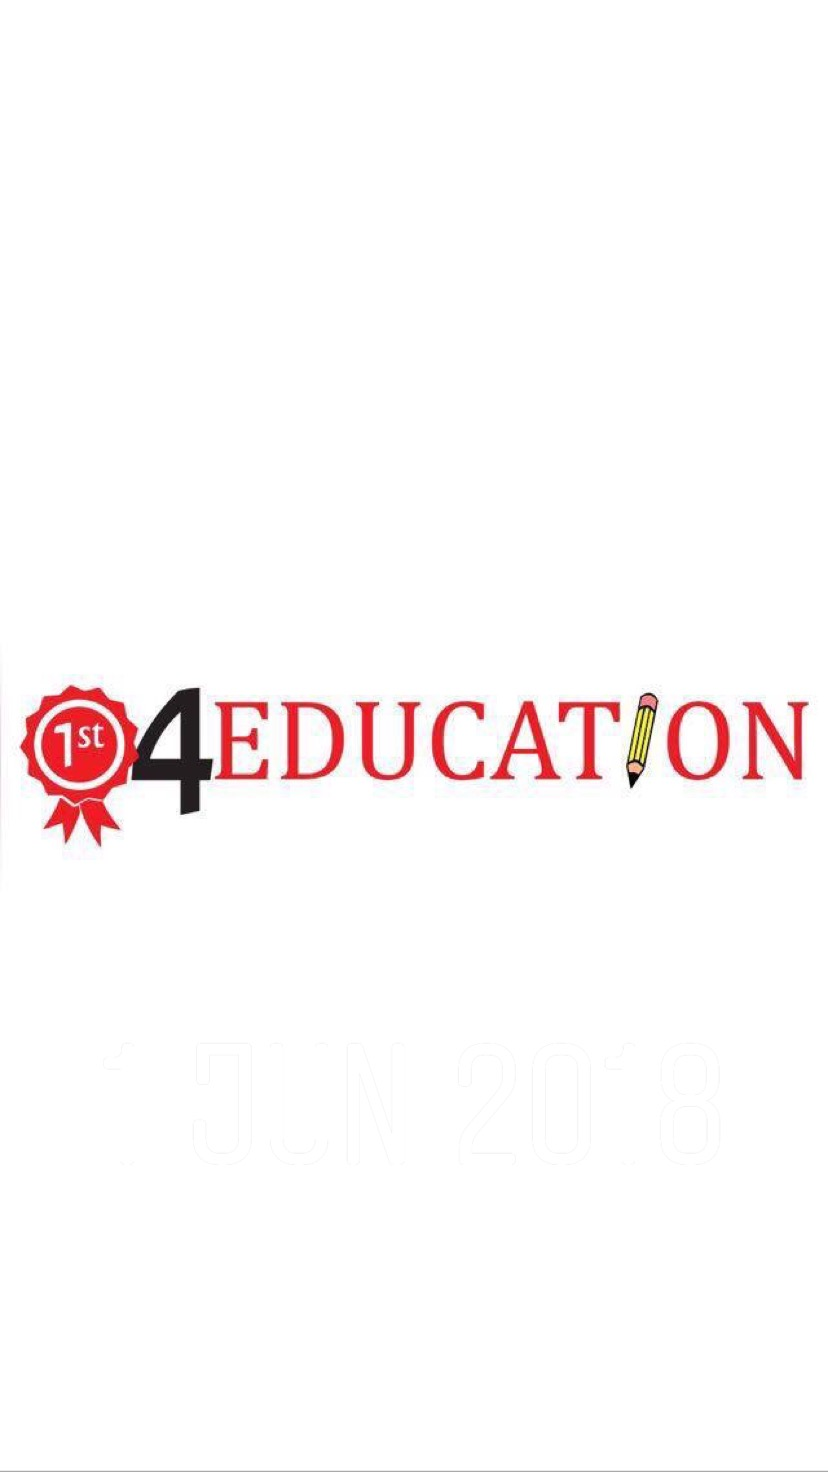 1st 4 Education